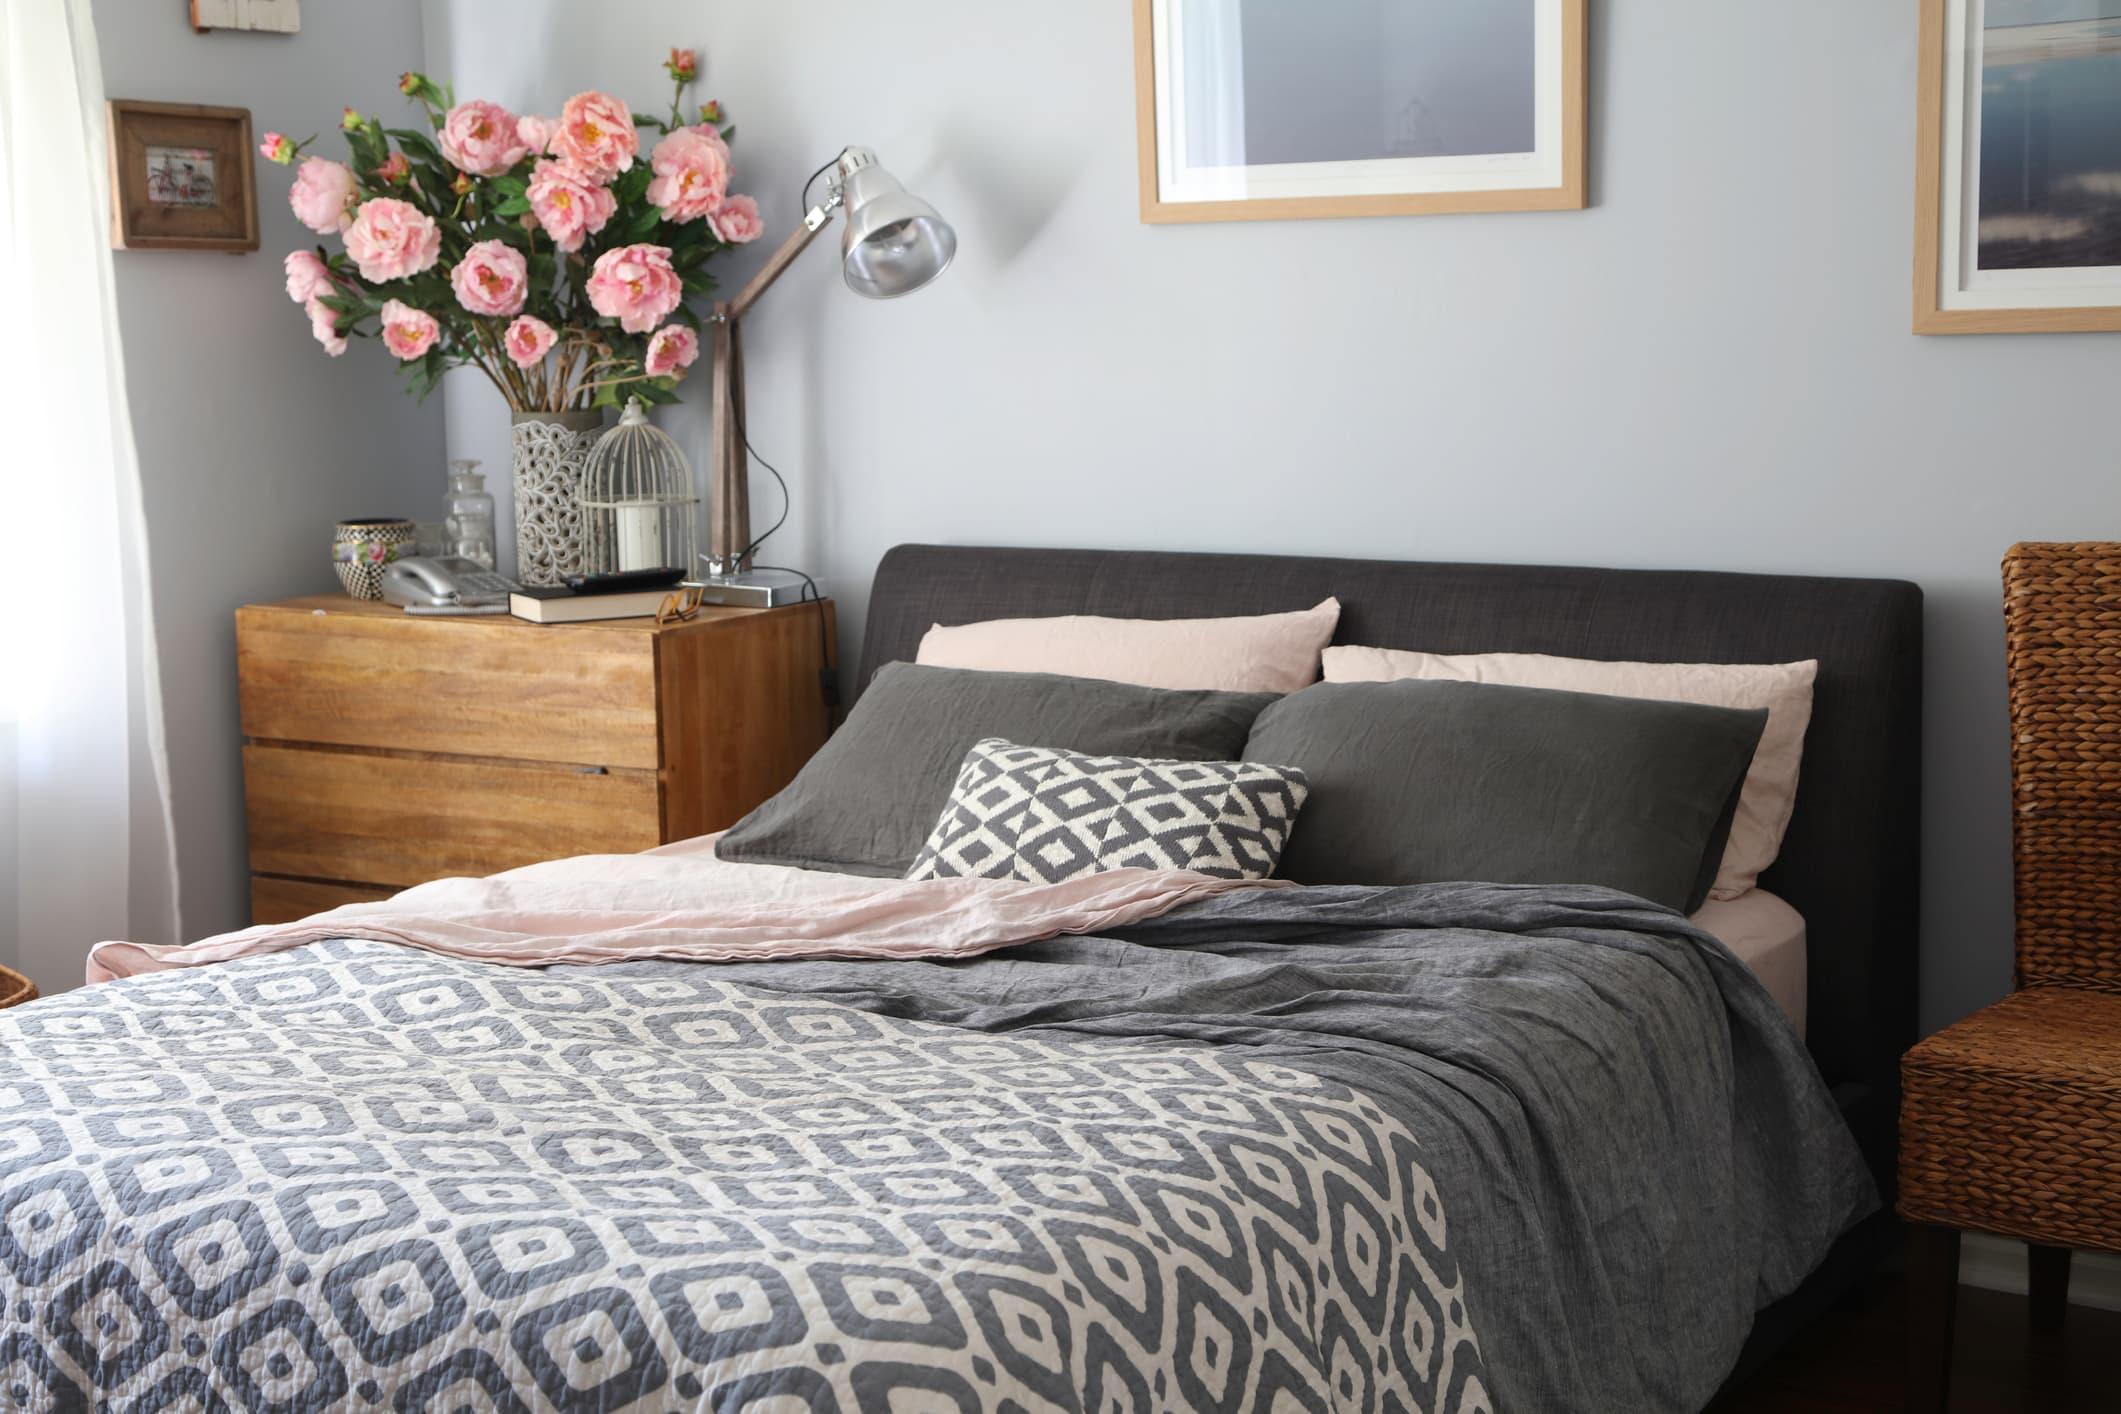 habitaciones-rosa-gris